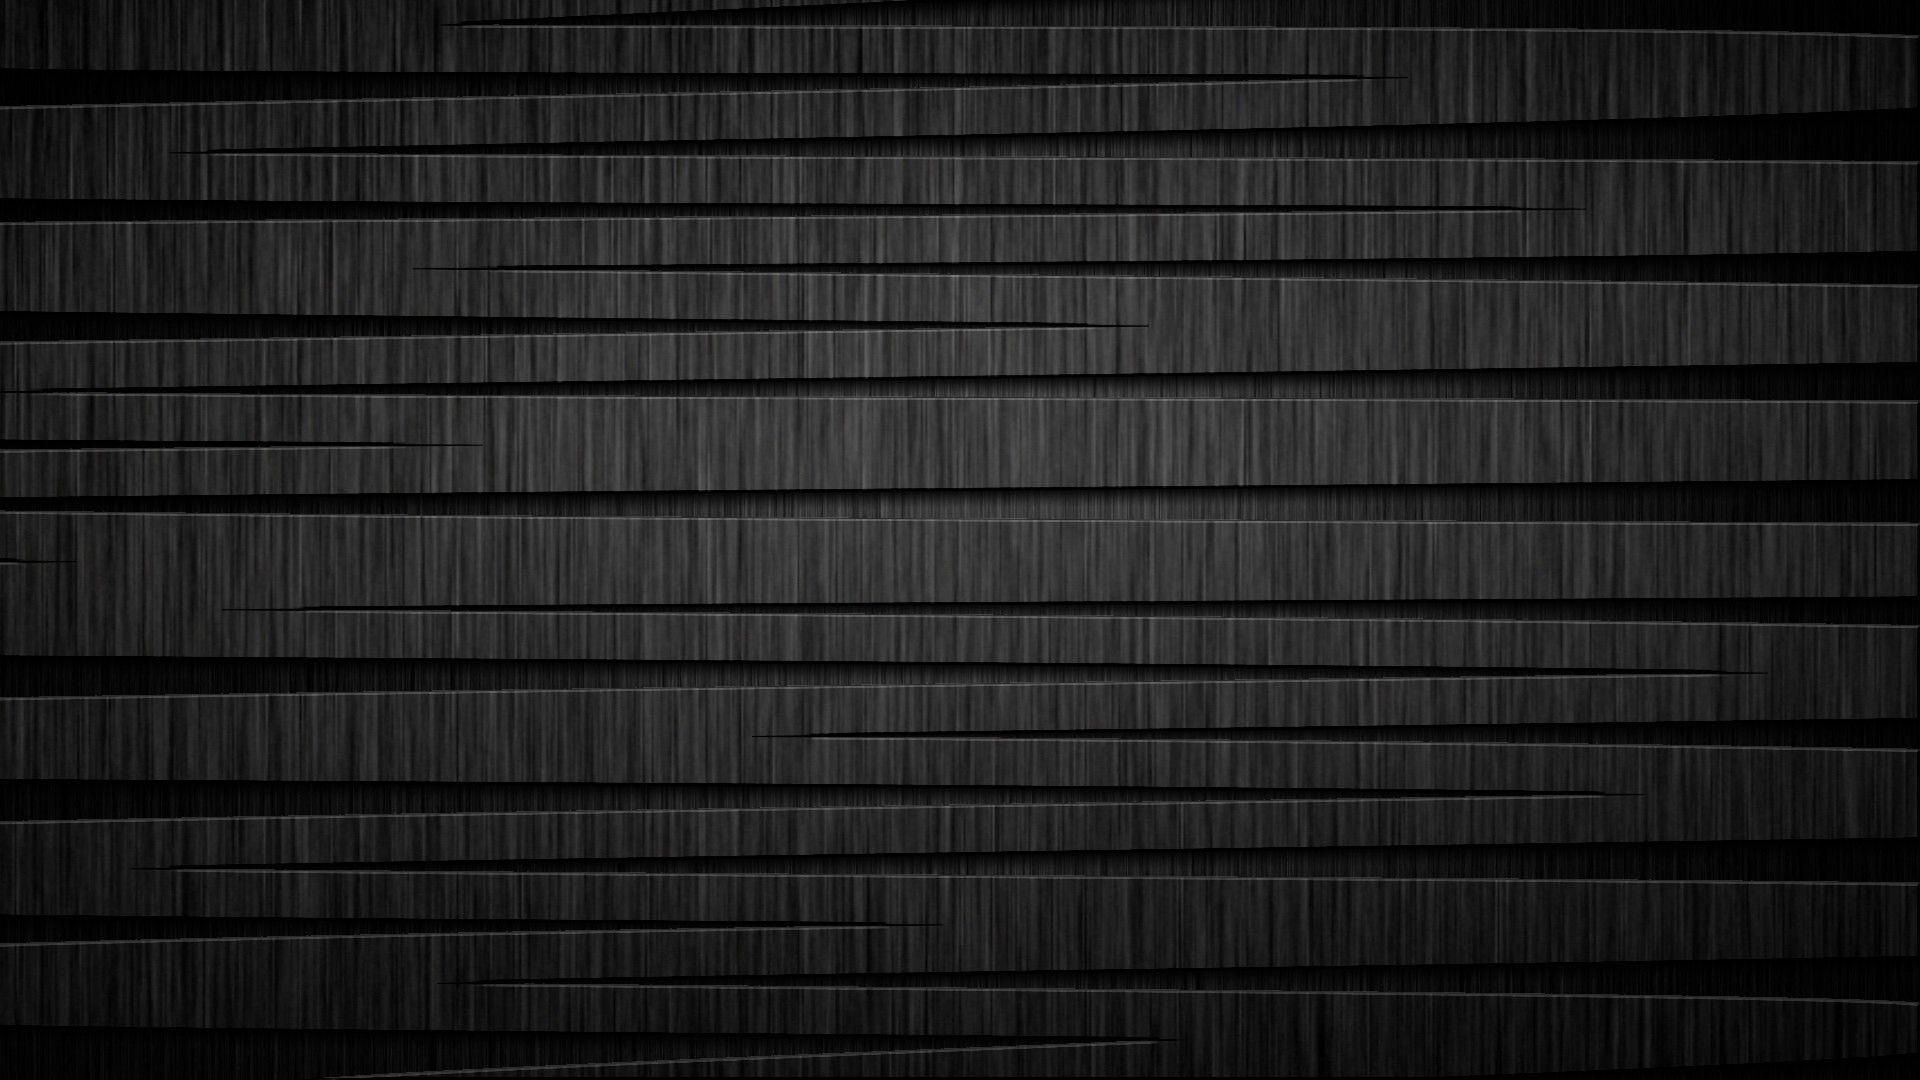 wallpapers for dark pattern wallpaper hd